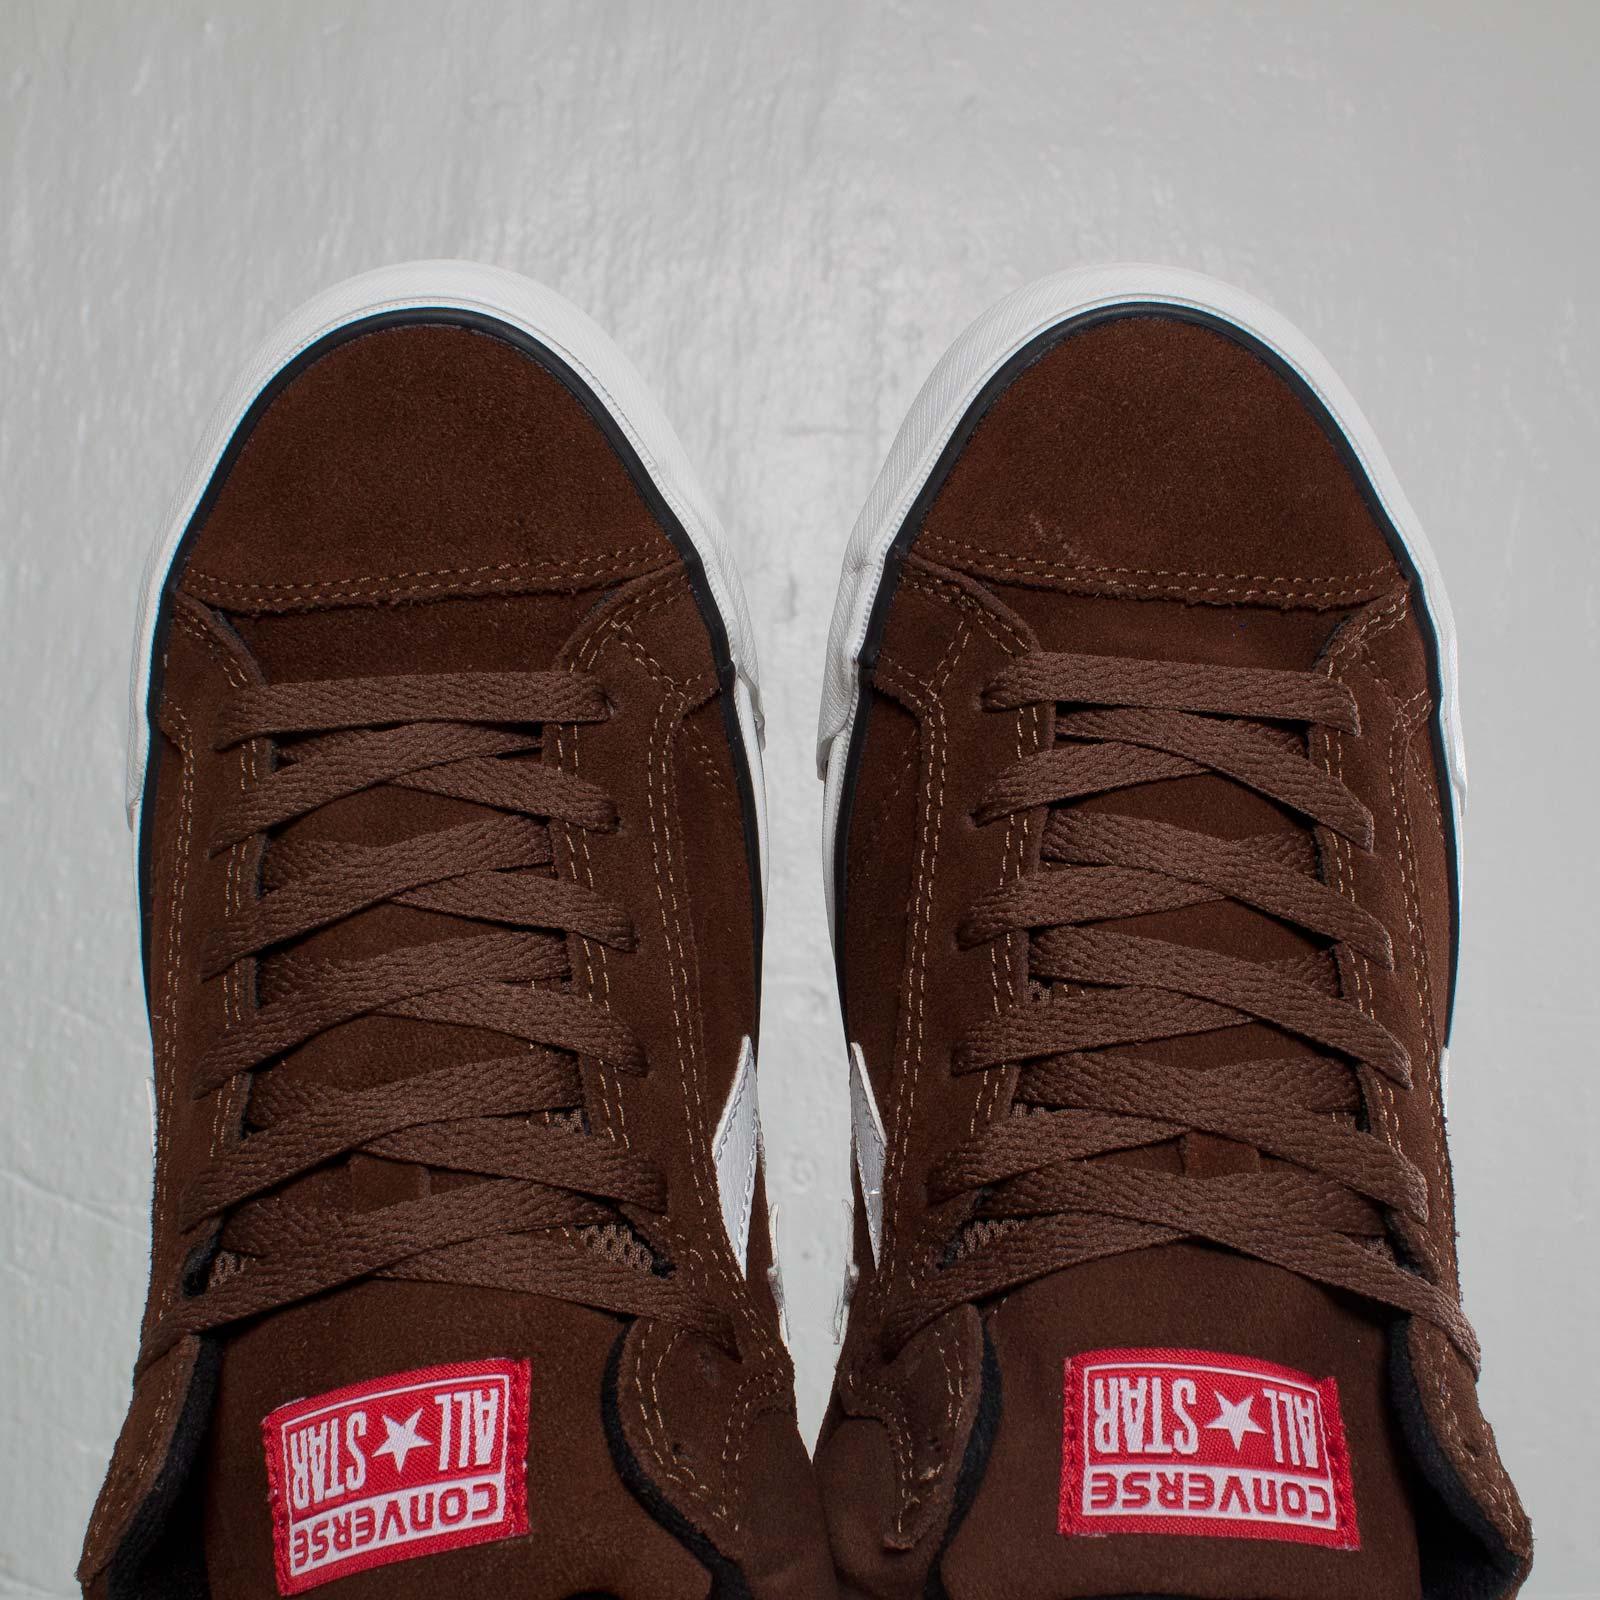 a8103c181cec Converse Rune Pro II Suede Mid - 110550 - Sneakersnstuff